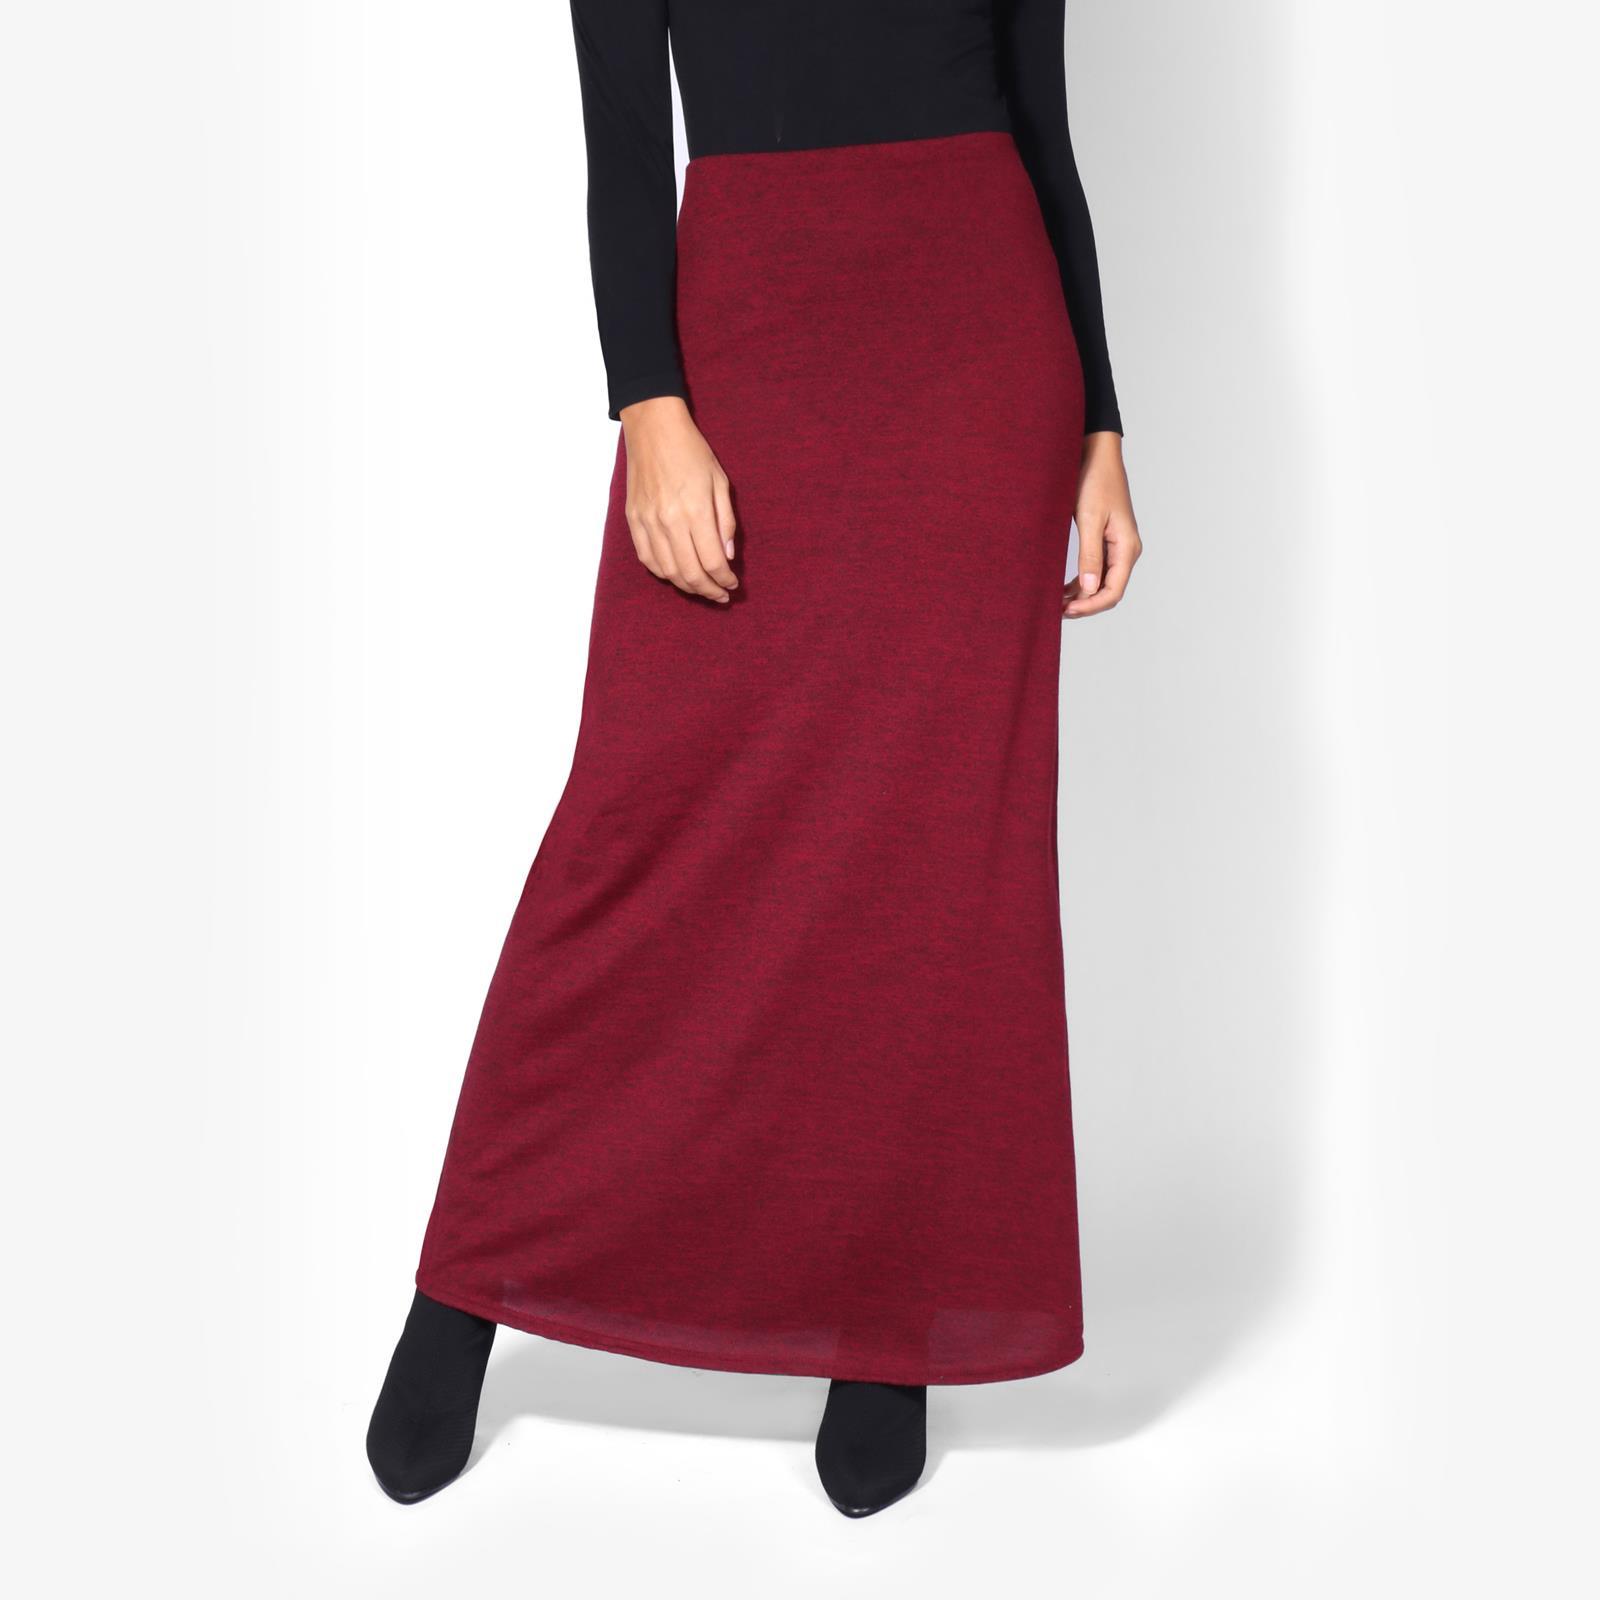 Womens-Ladies-Maxi-Skirt-High-Waist-A-Line-Long-Knit-Stretch-Bodycon-Casual-Boho thumbnail 18